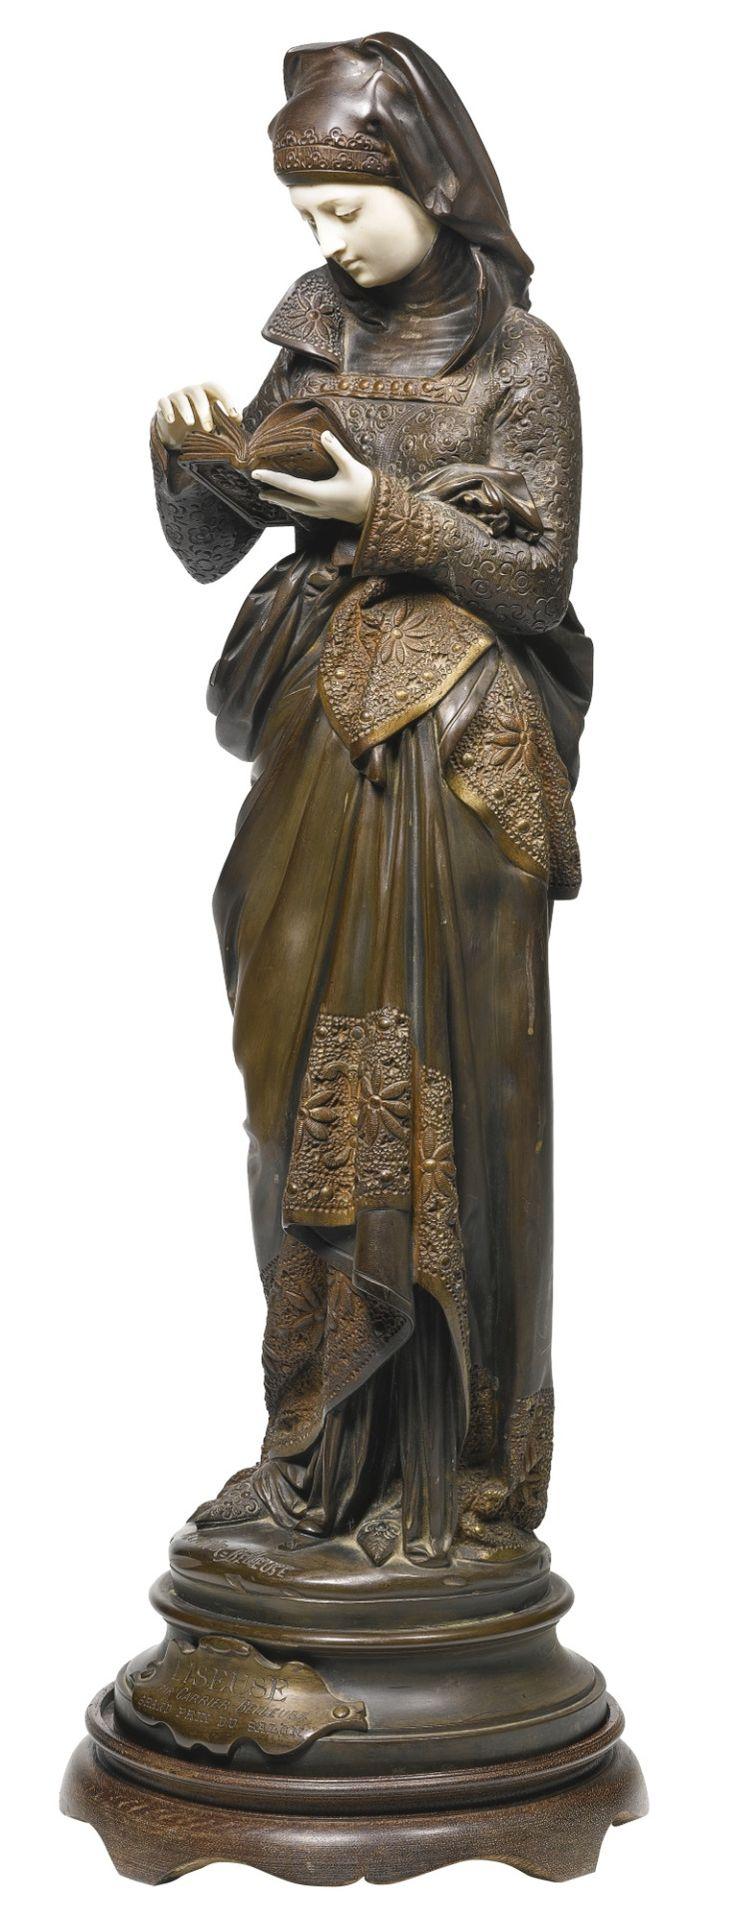 Albert-Ernest Carrier-Belleuse (1824-1887), La Liseuse.   http://41.media.tumblr.com/041761825120802c2ee836c67944284c/tumblr_nyooyvFMUZ1uvd0n3o1_1280.jpg